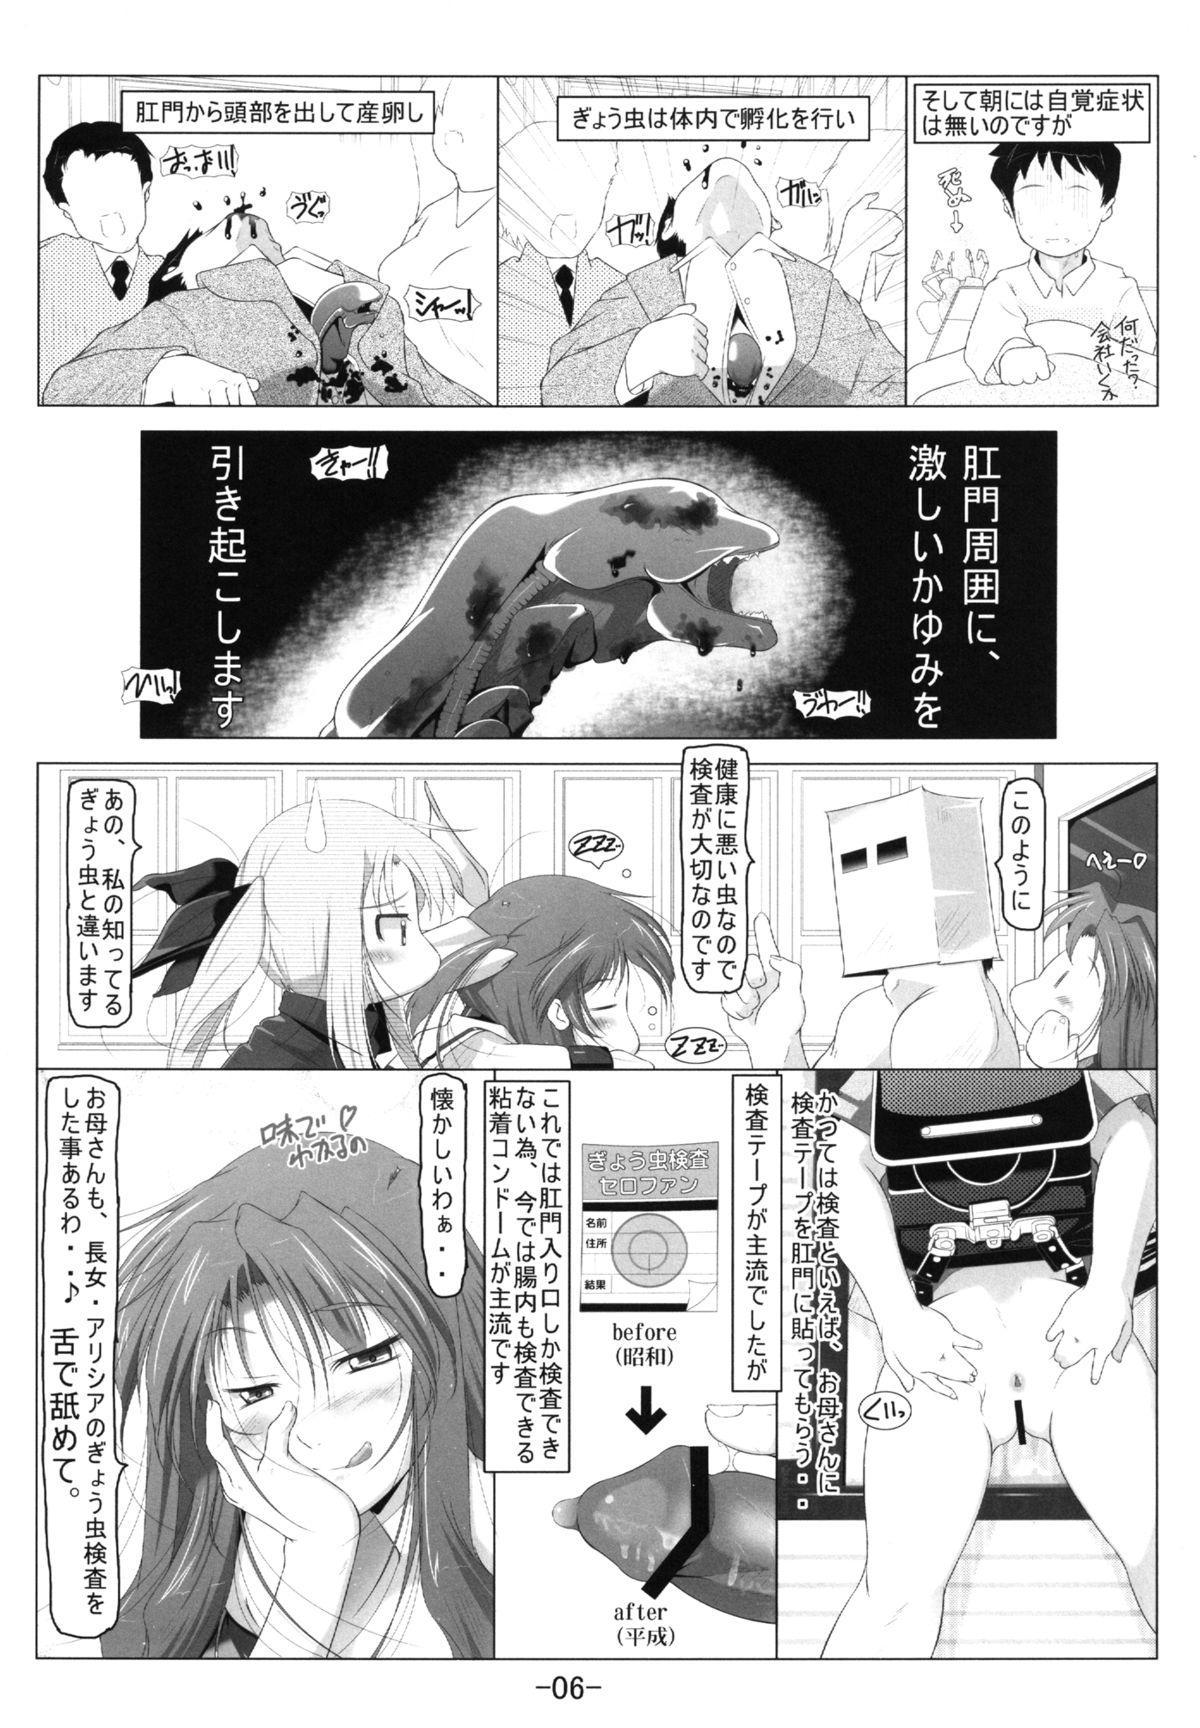 NanoFa + Alicia wo Ochinchin de Gyouchuu Kensa 8